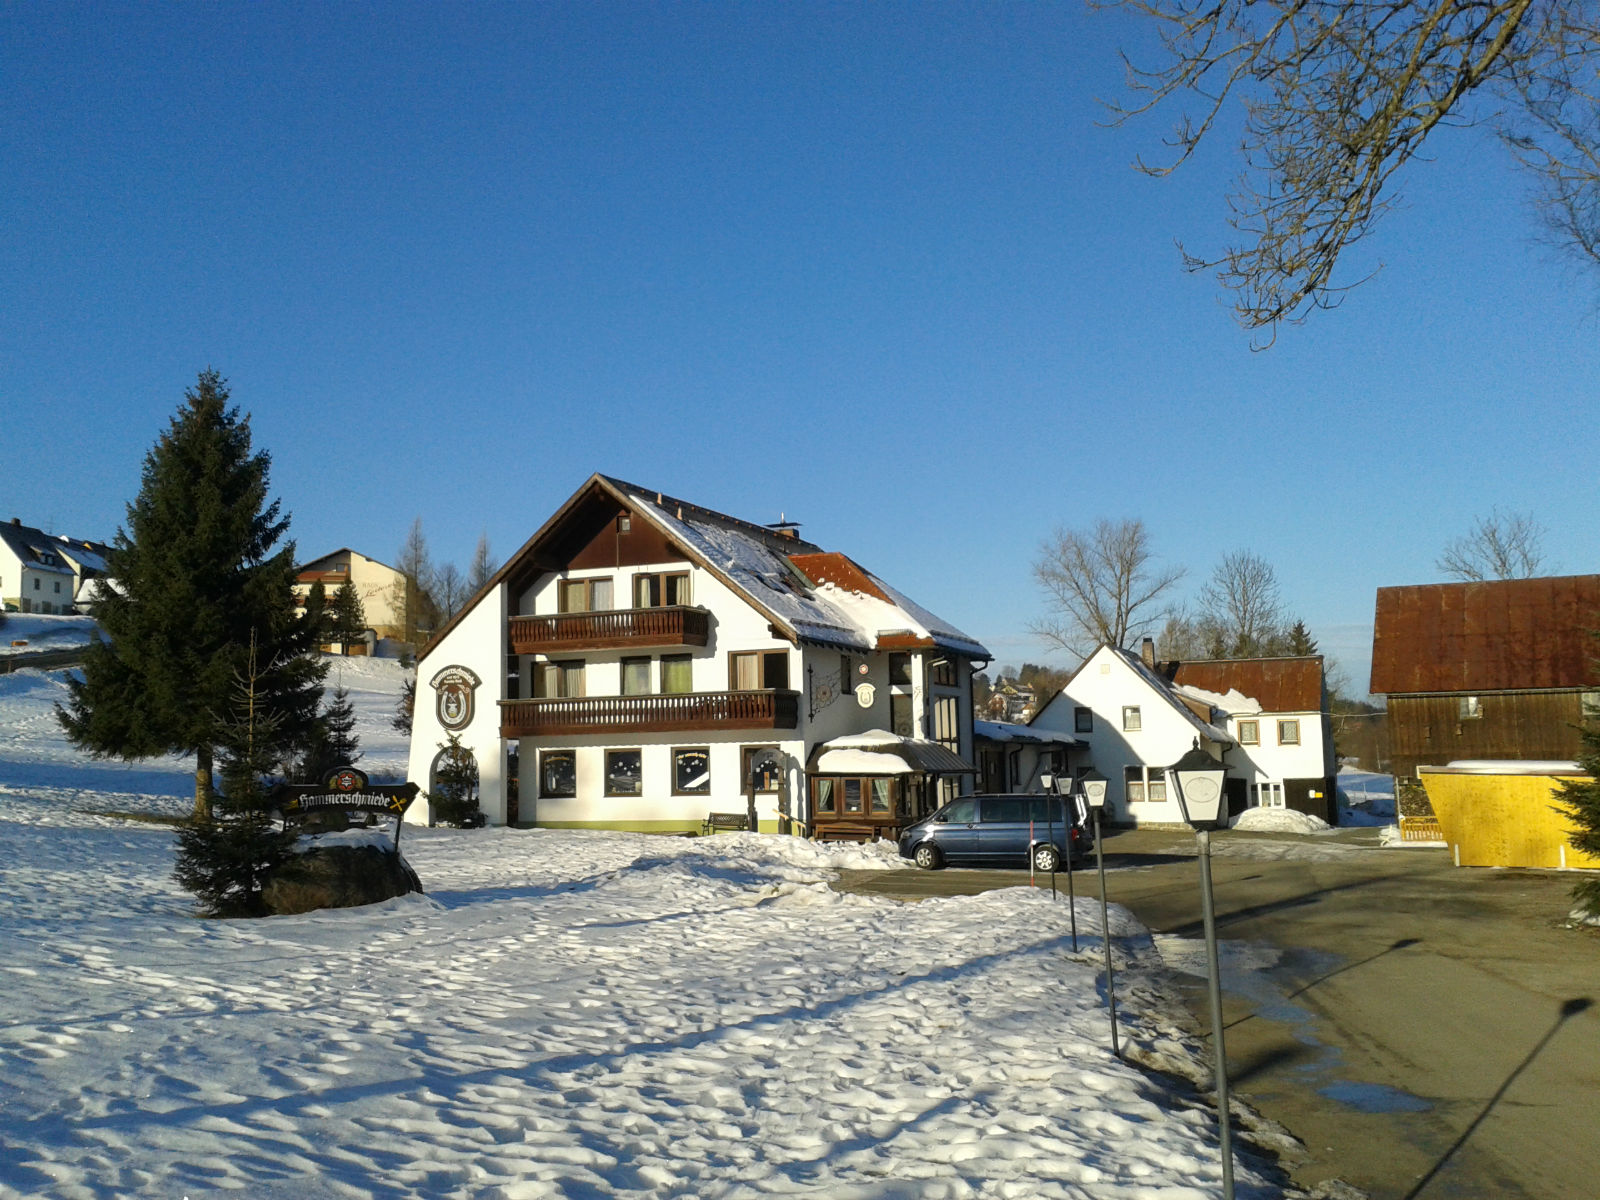 Hammerschmiede-Unser-Haus-Winteransicht